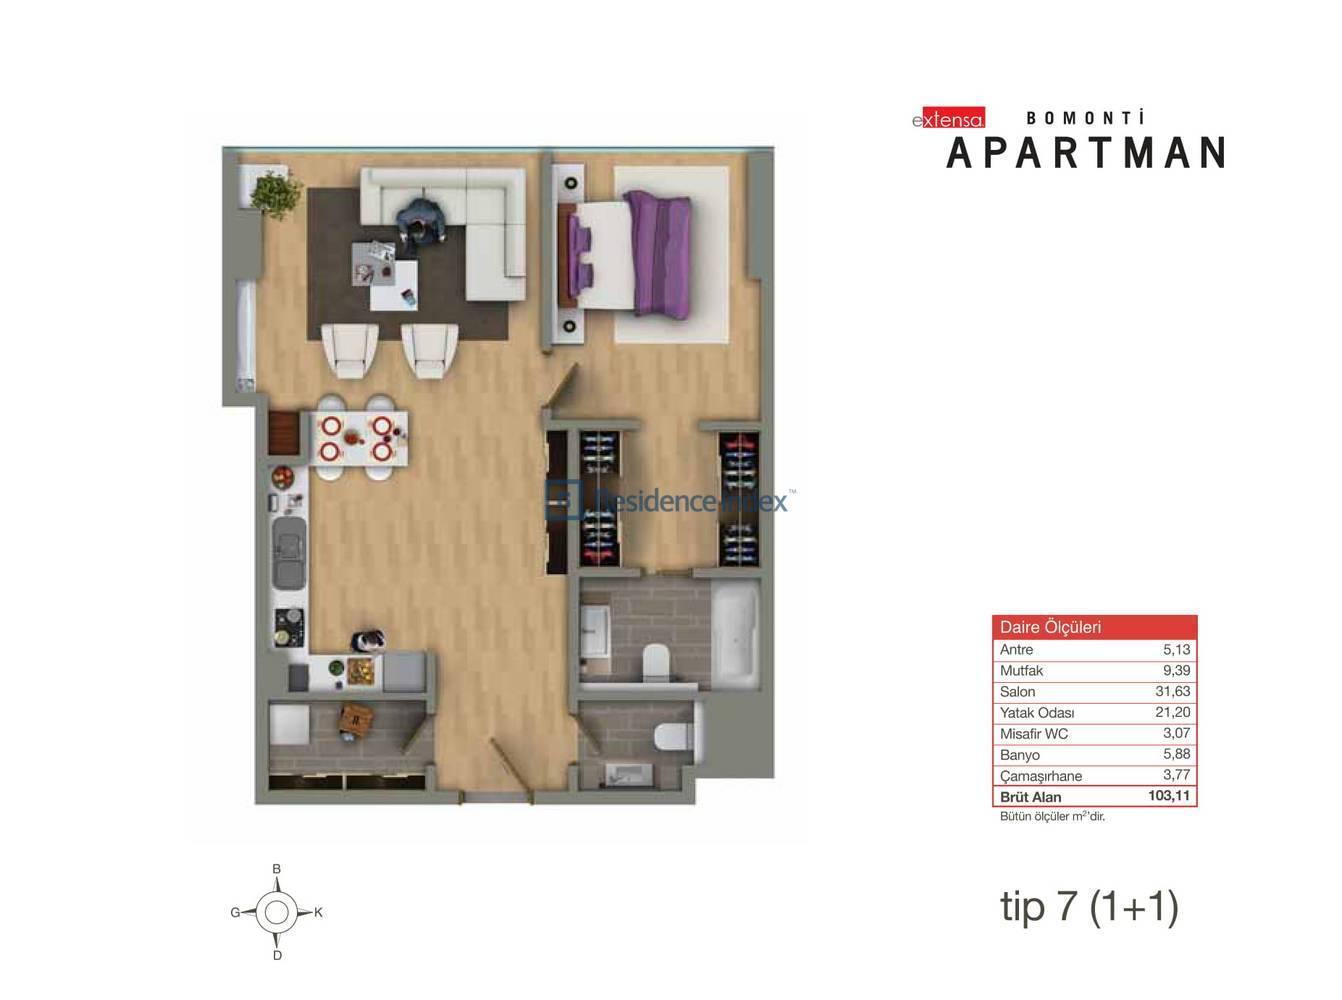 Bomonti Apartmanı Tip 7